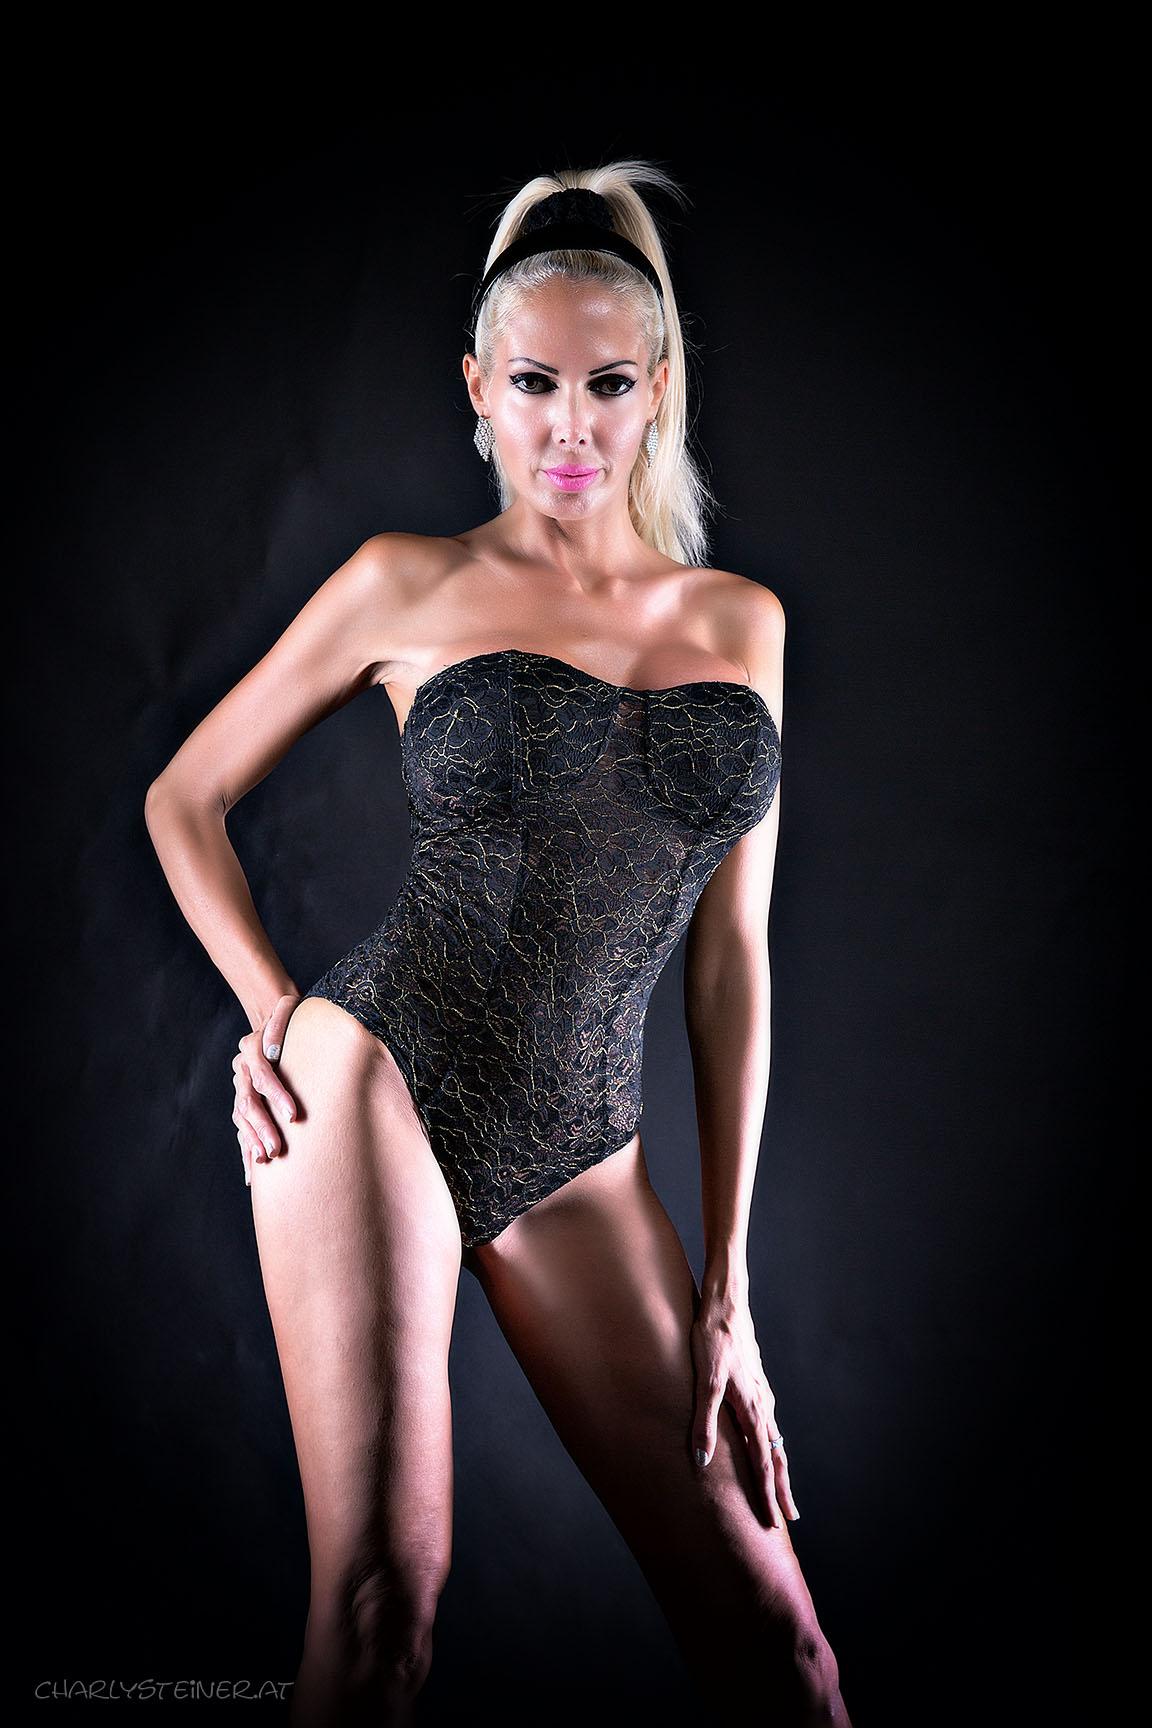 Stripperin Danielle Gloss buchen